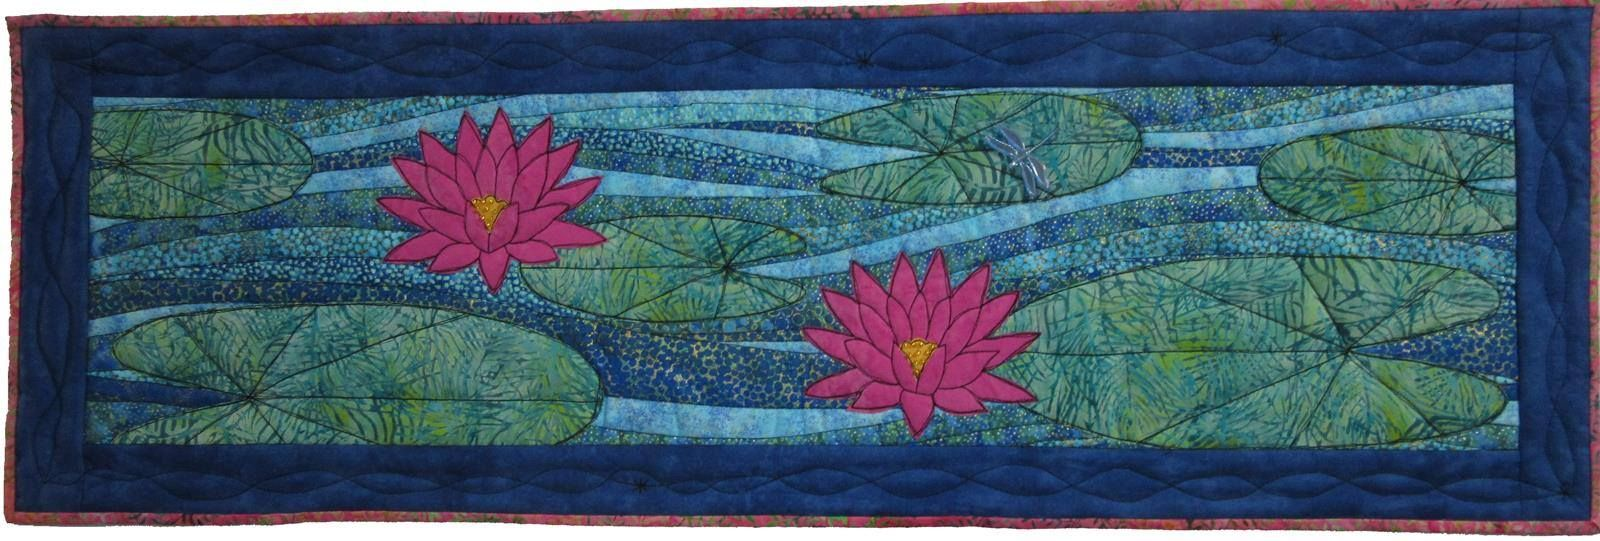 Michigan - Quilts 'n Stuff by Glenna in Escanaba | Row-By-Row ... : michigan quilts - Adamdwight.com